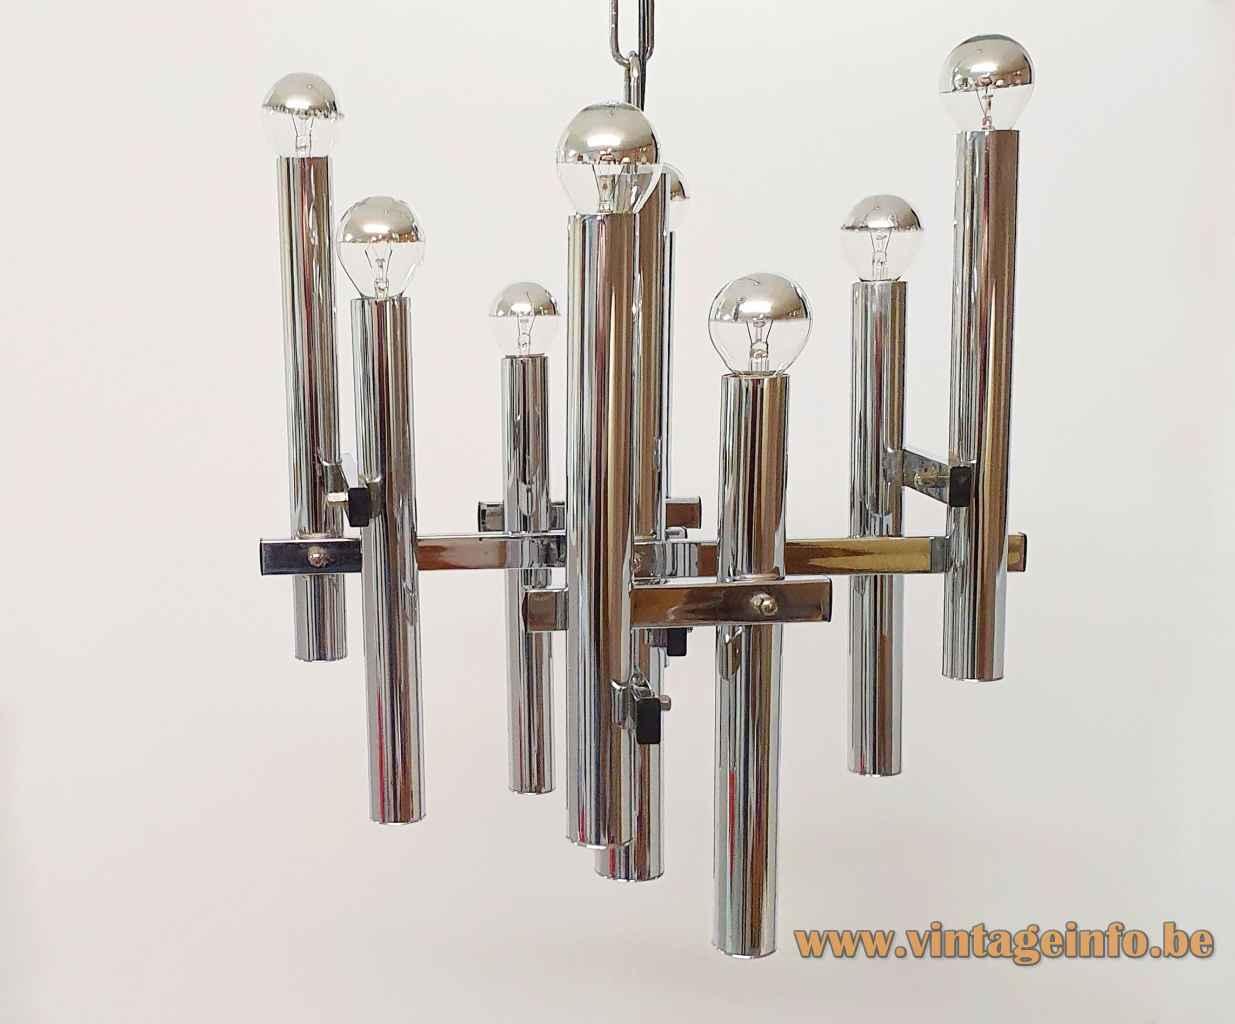 Sciolari style chrome chandelier metal rods, chain & tubes lampshade 8 E14 sockets 1970s Massive Belgium